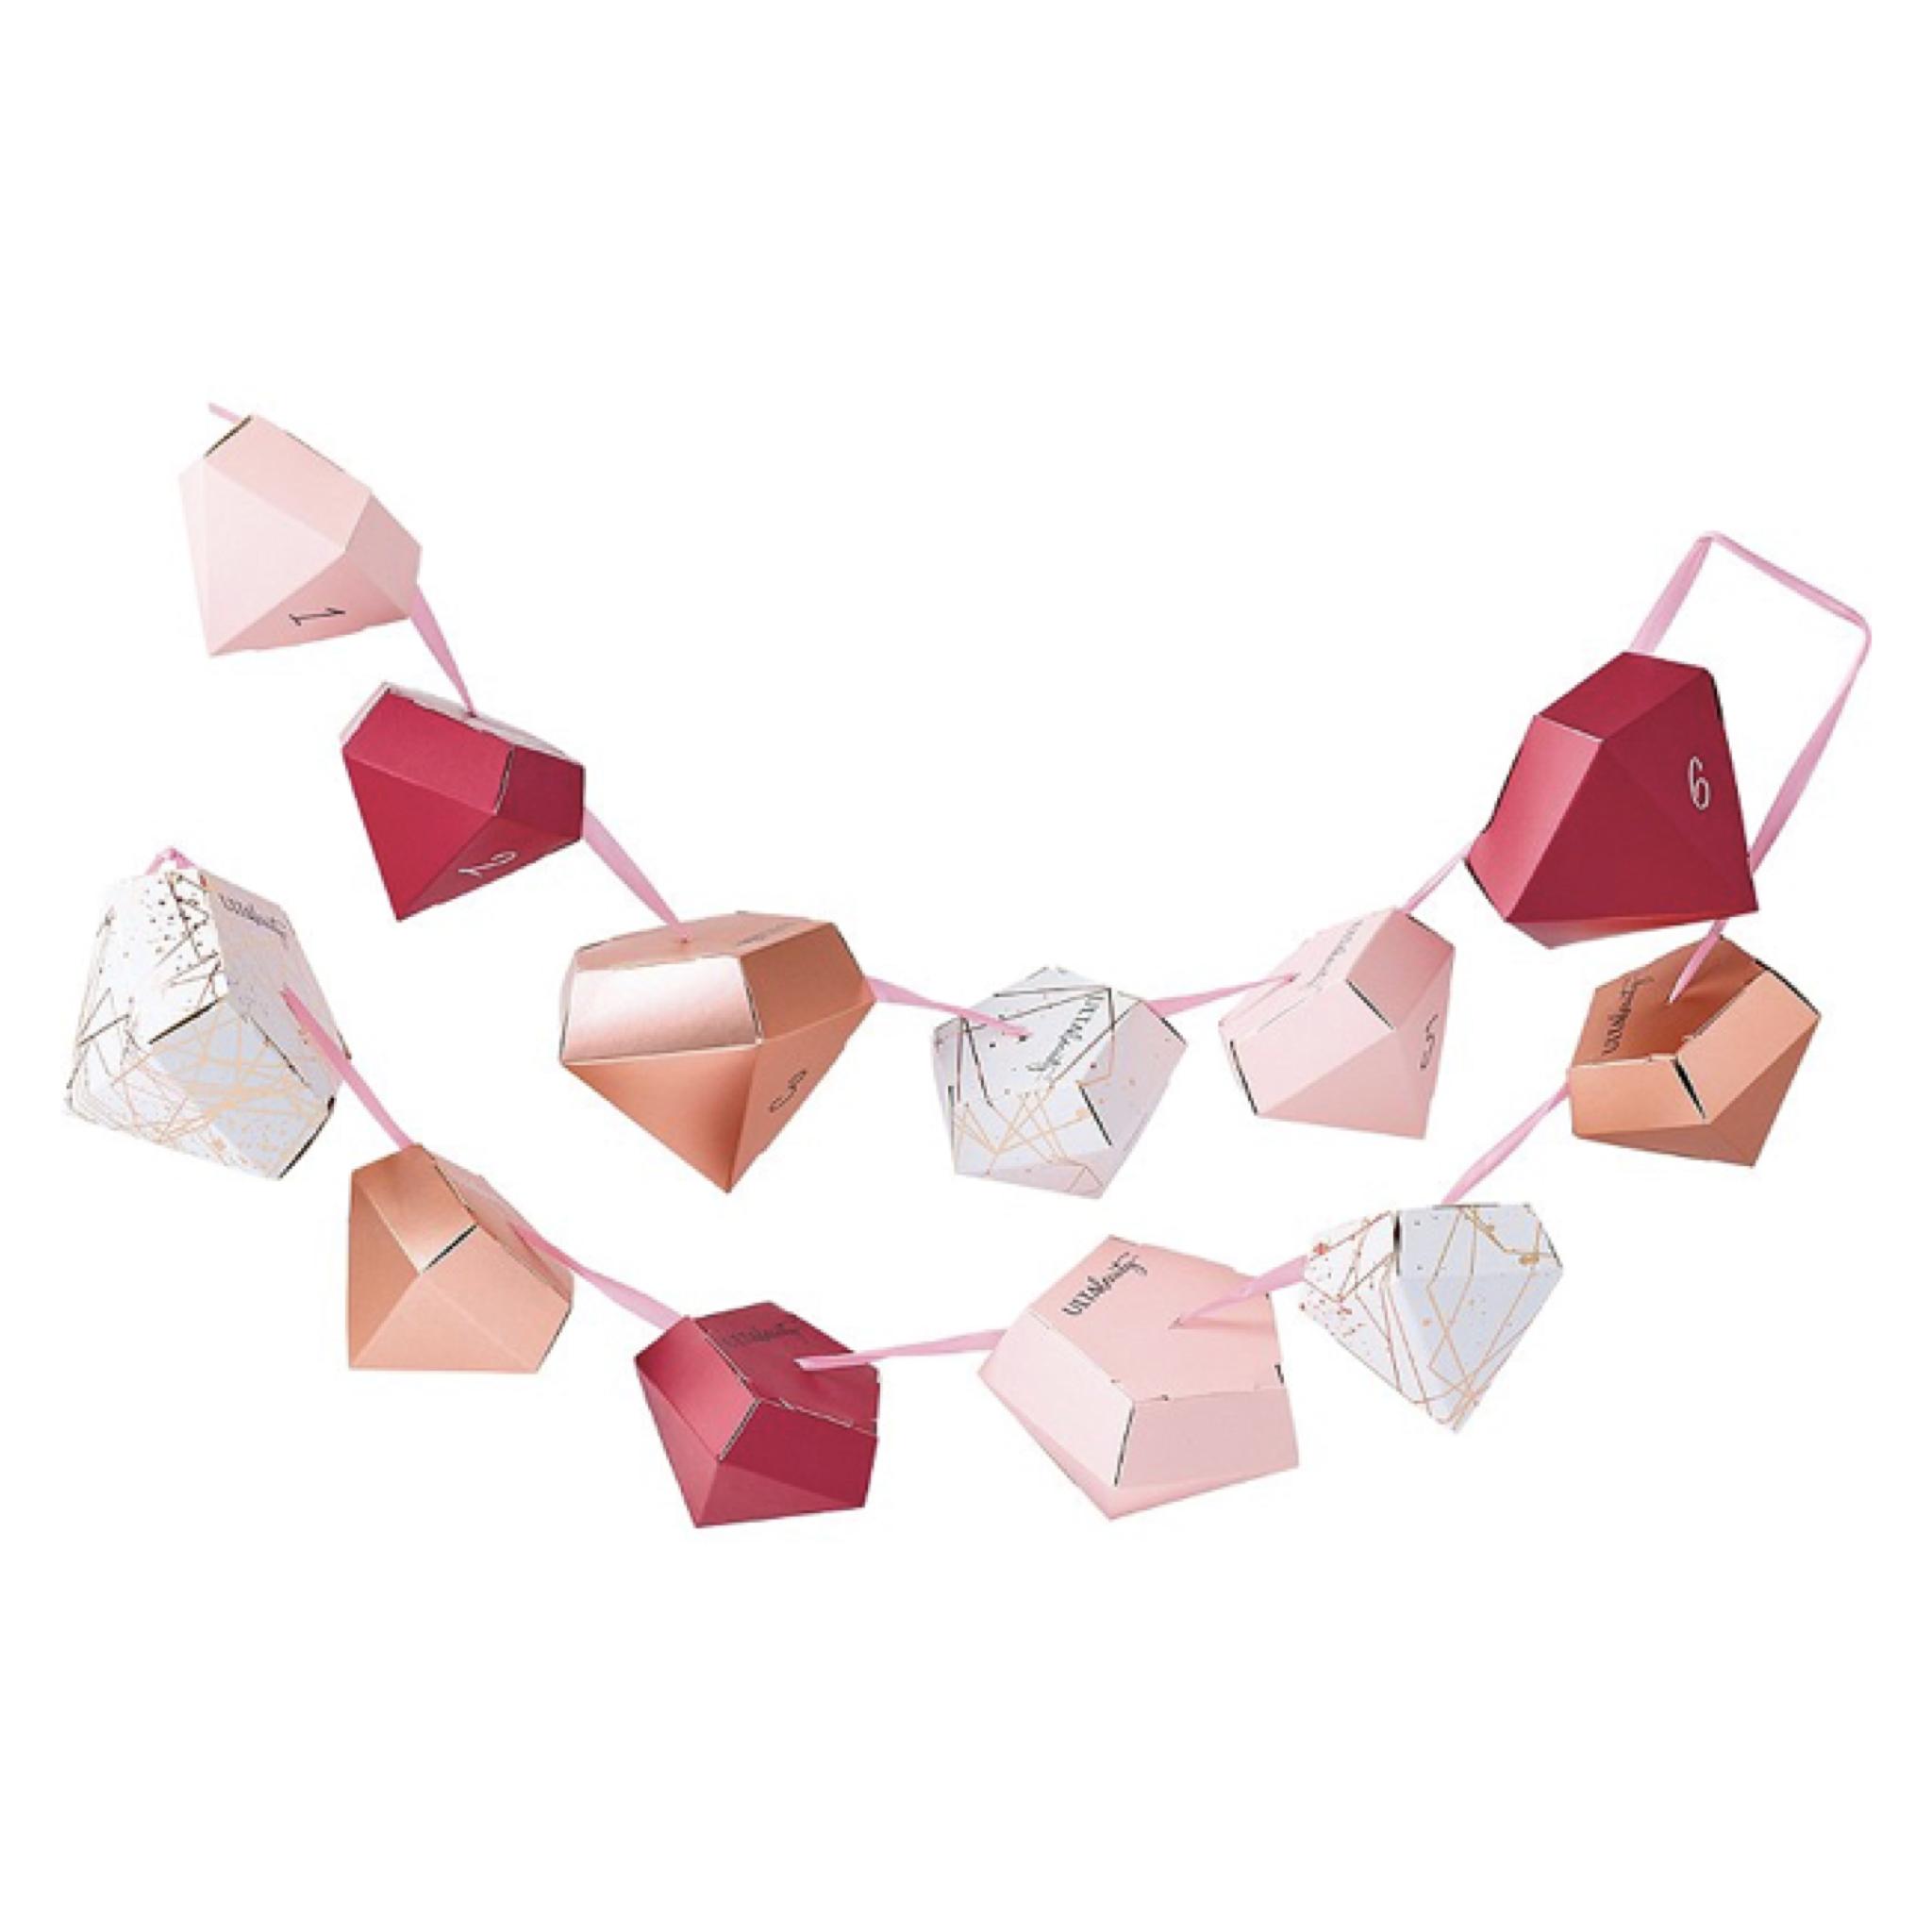 ULTA 12 Days of Beauty Advent Calendar